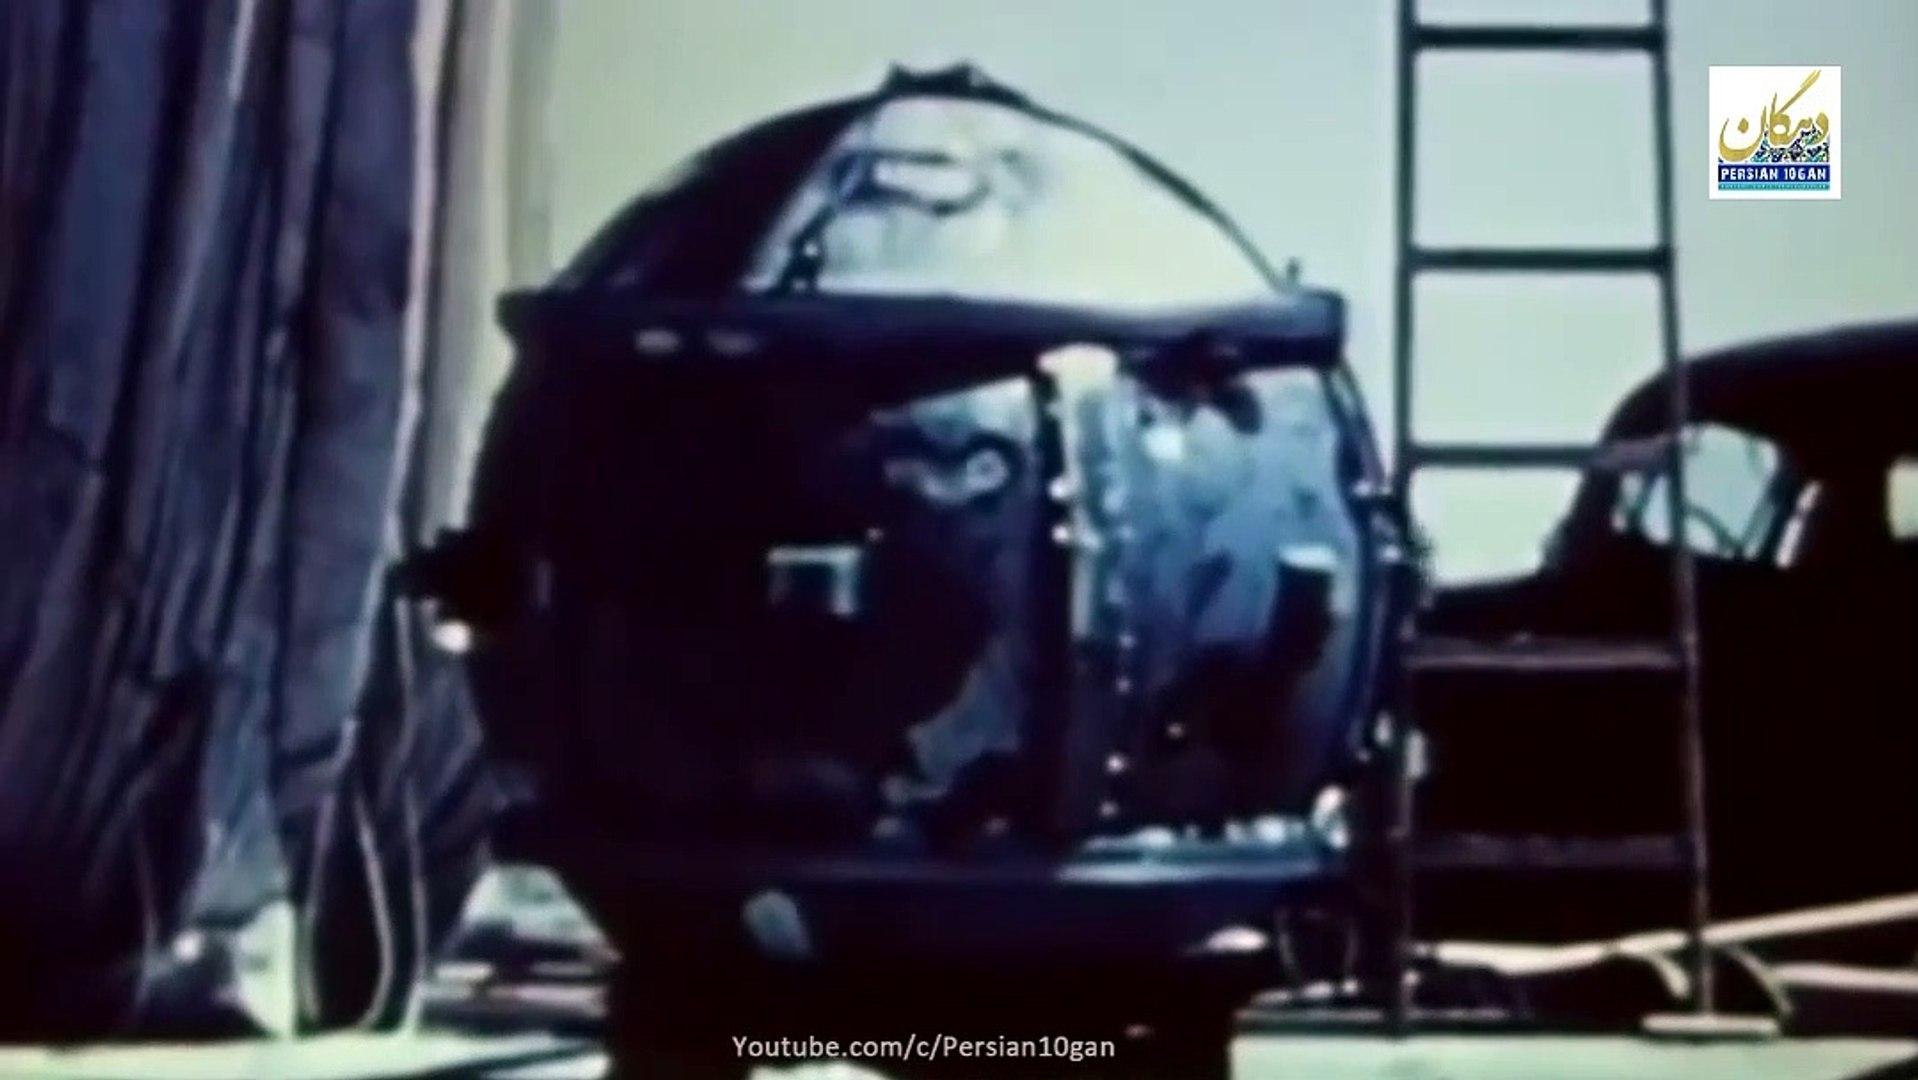 E 4 - P 4 -بمباران اتمی: ویرانی هیروشیما و ناگاساکی و پایان جنگ جهانی / Nuclear bombardmet